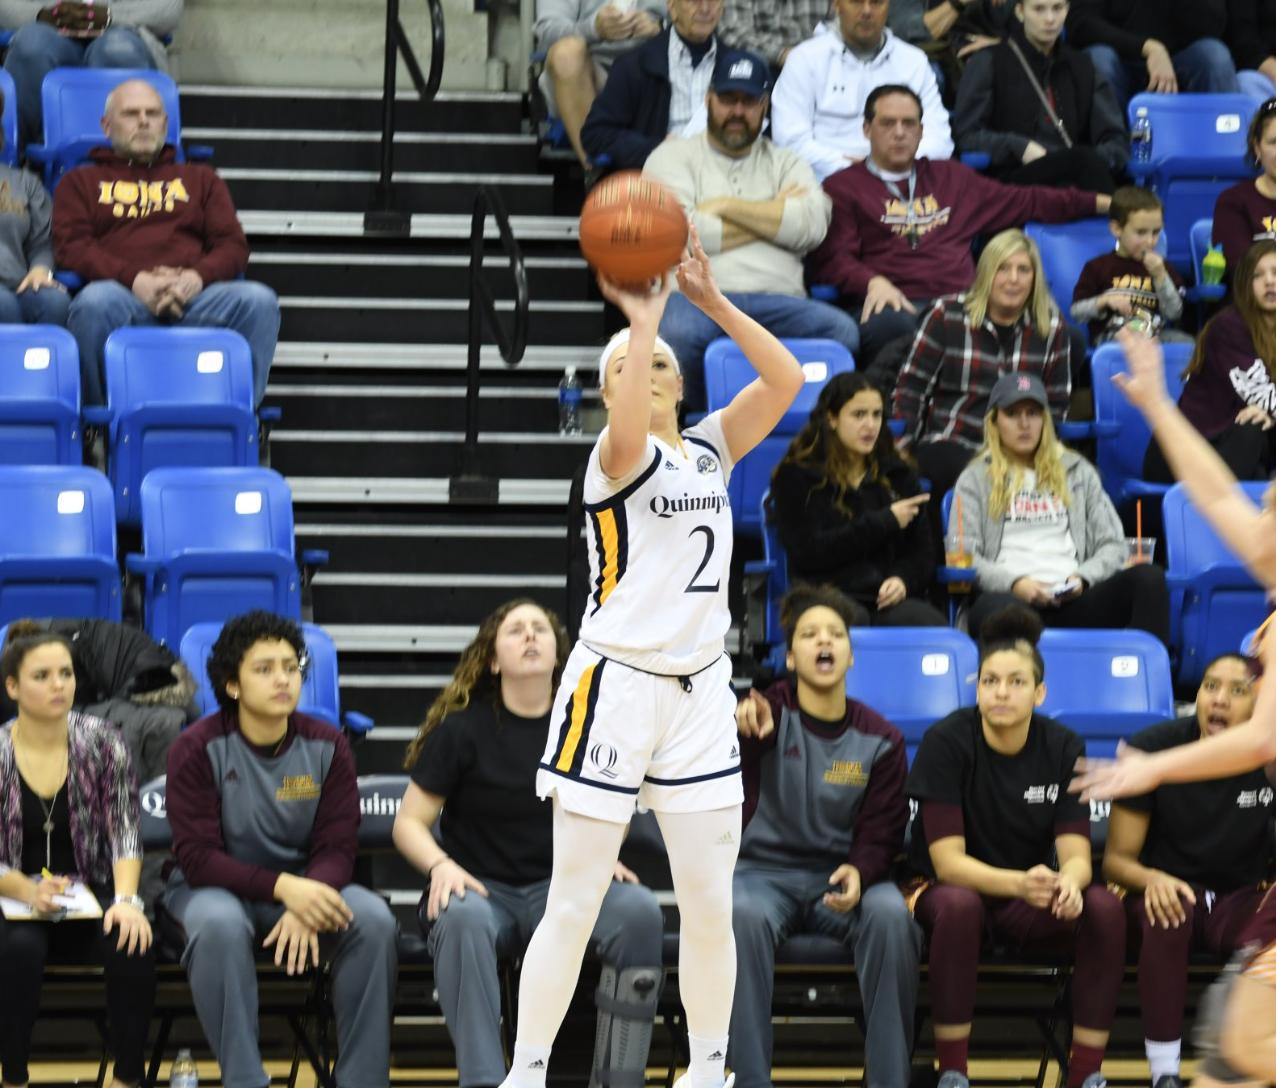 Quinnipiac women's basketball dominant again in 90-47 win over Iona